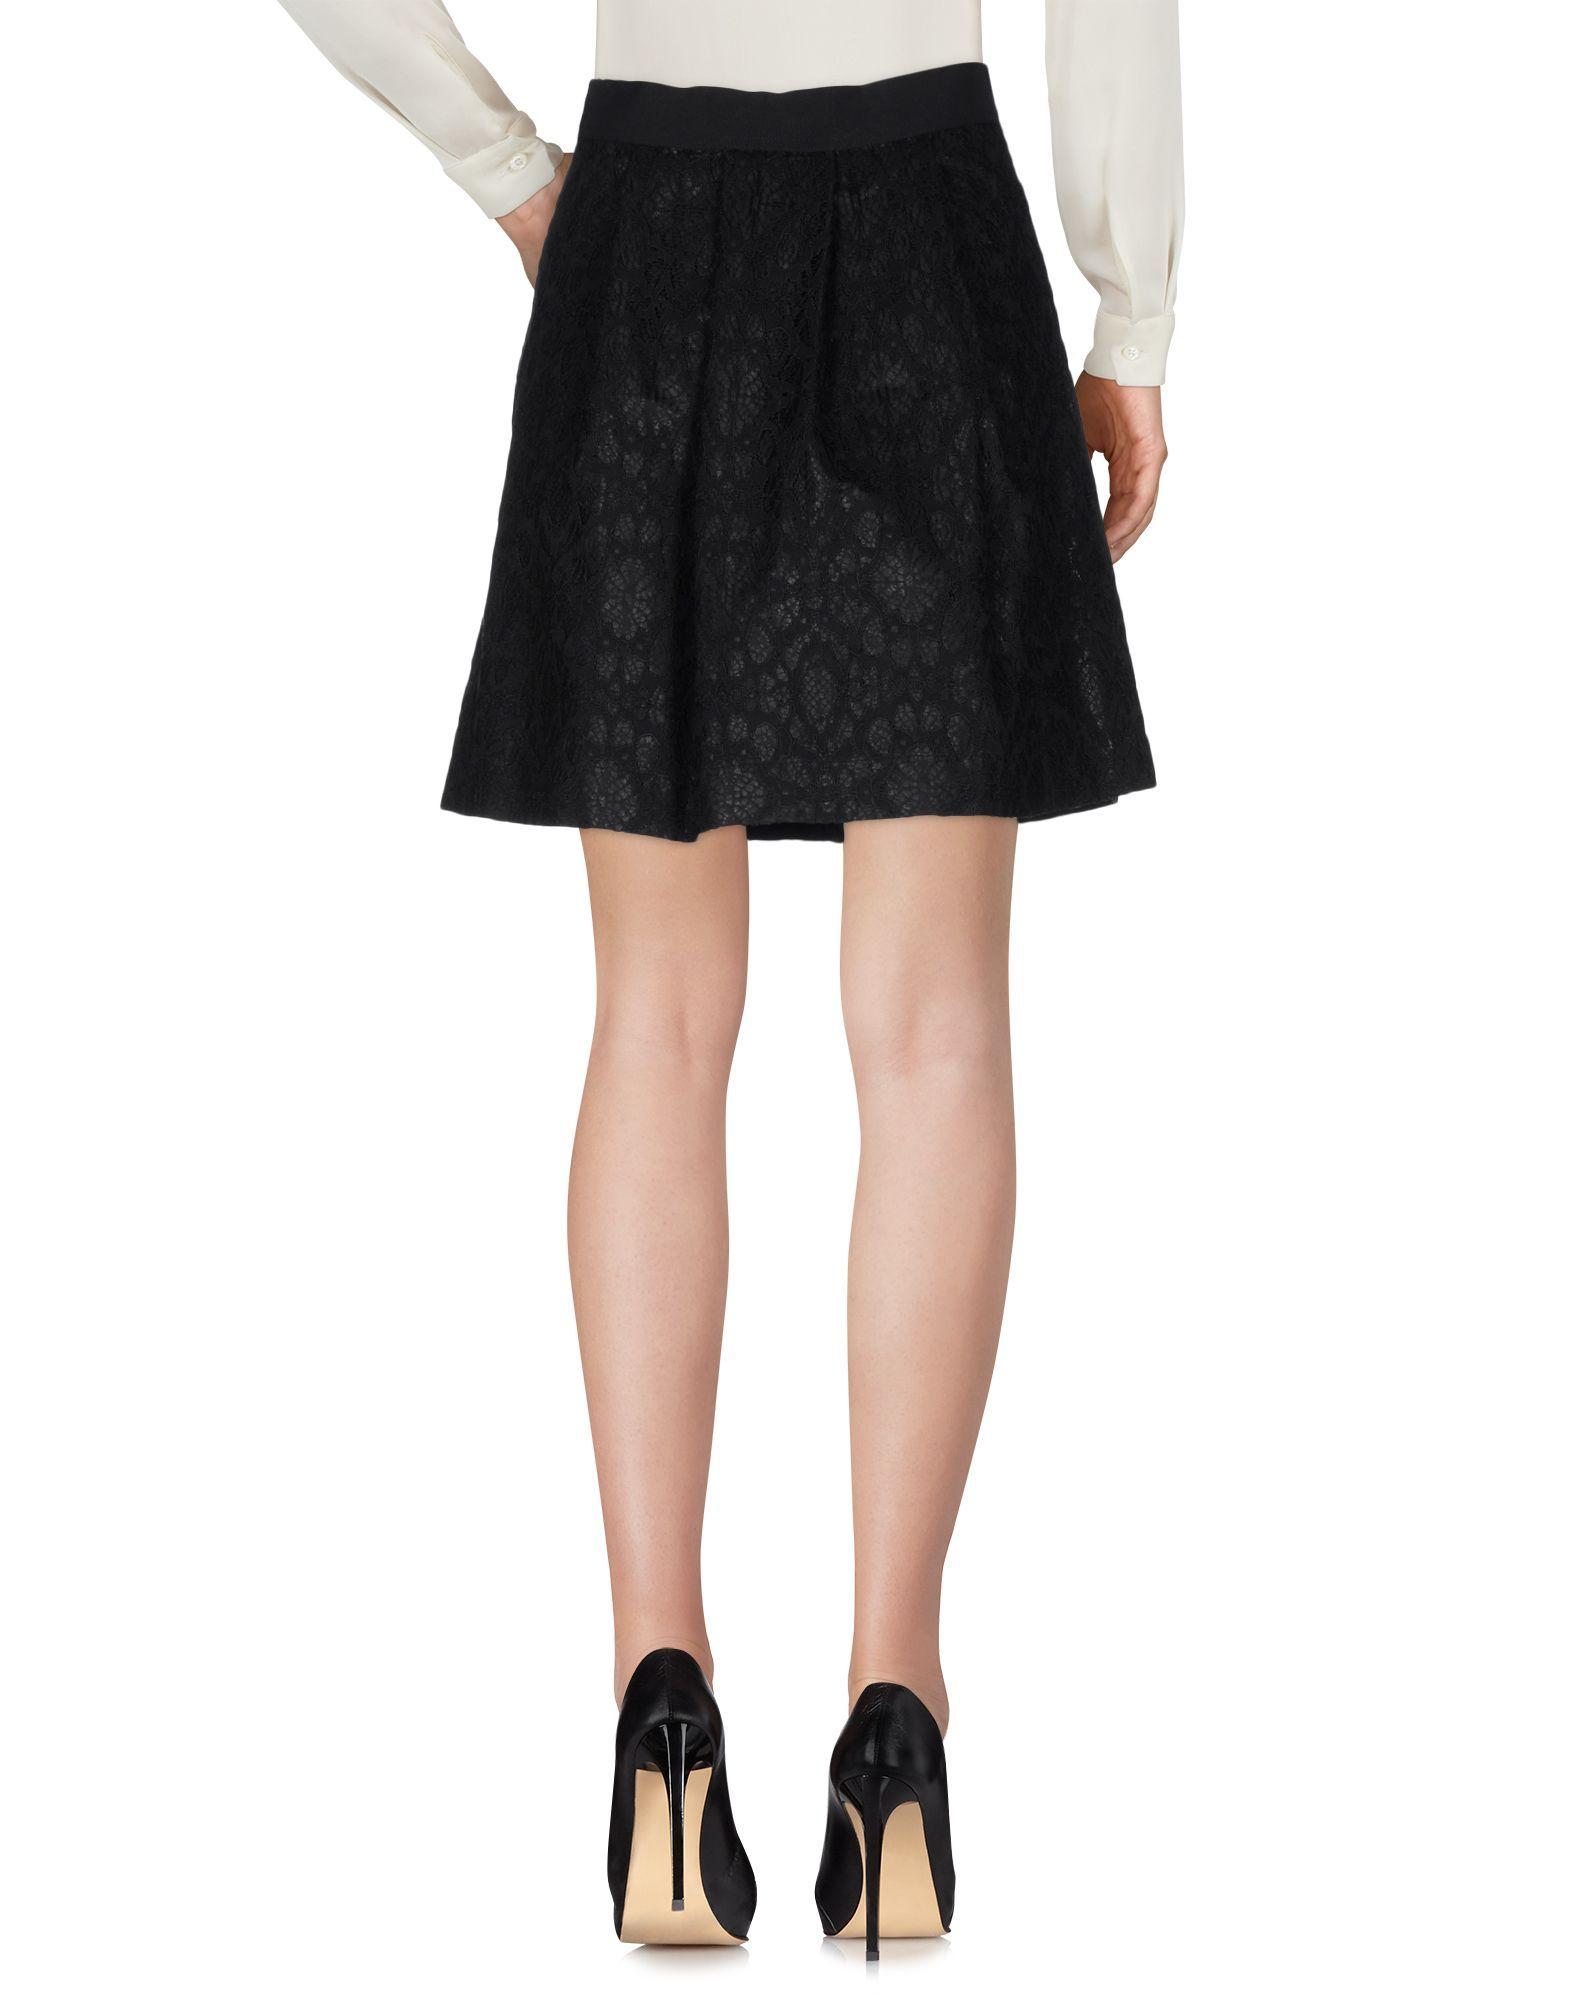 Pianurastudio Black Cotton Lace Skirt